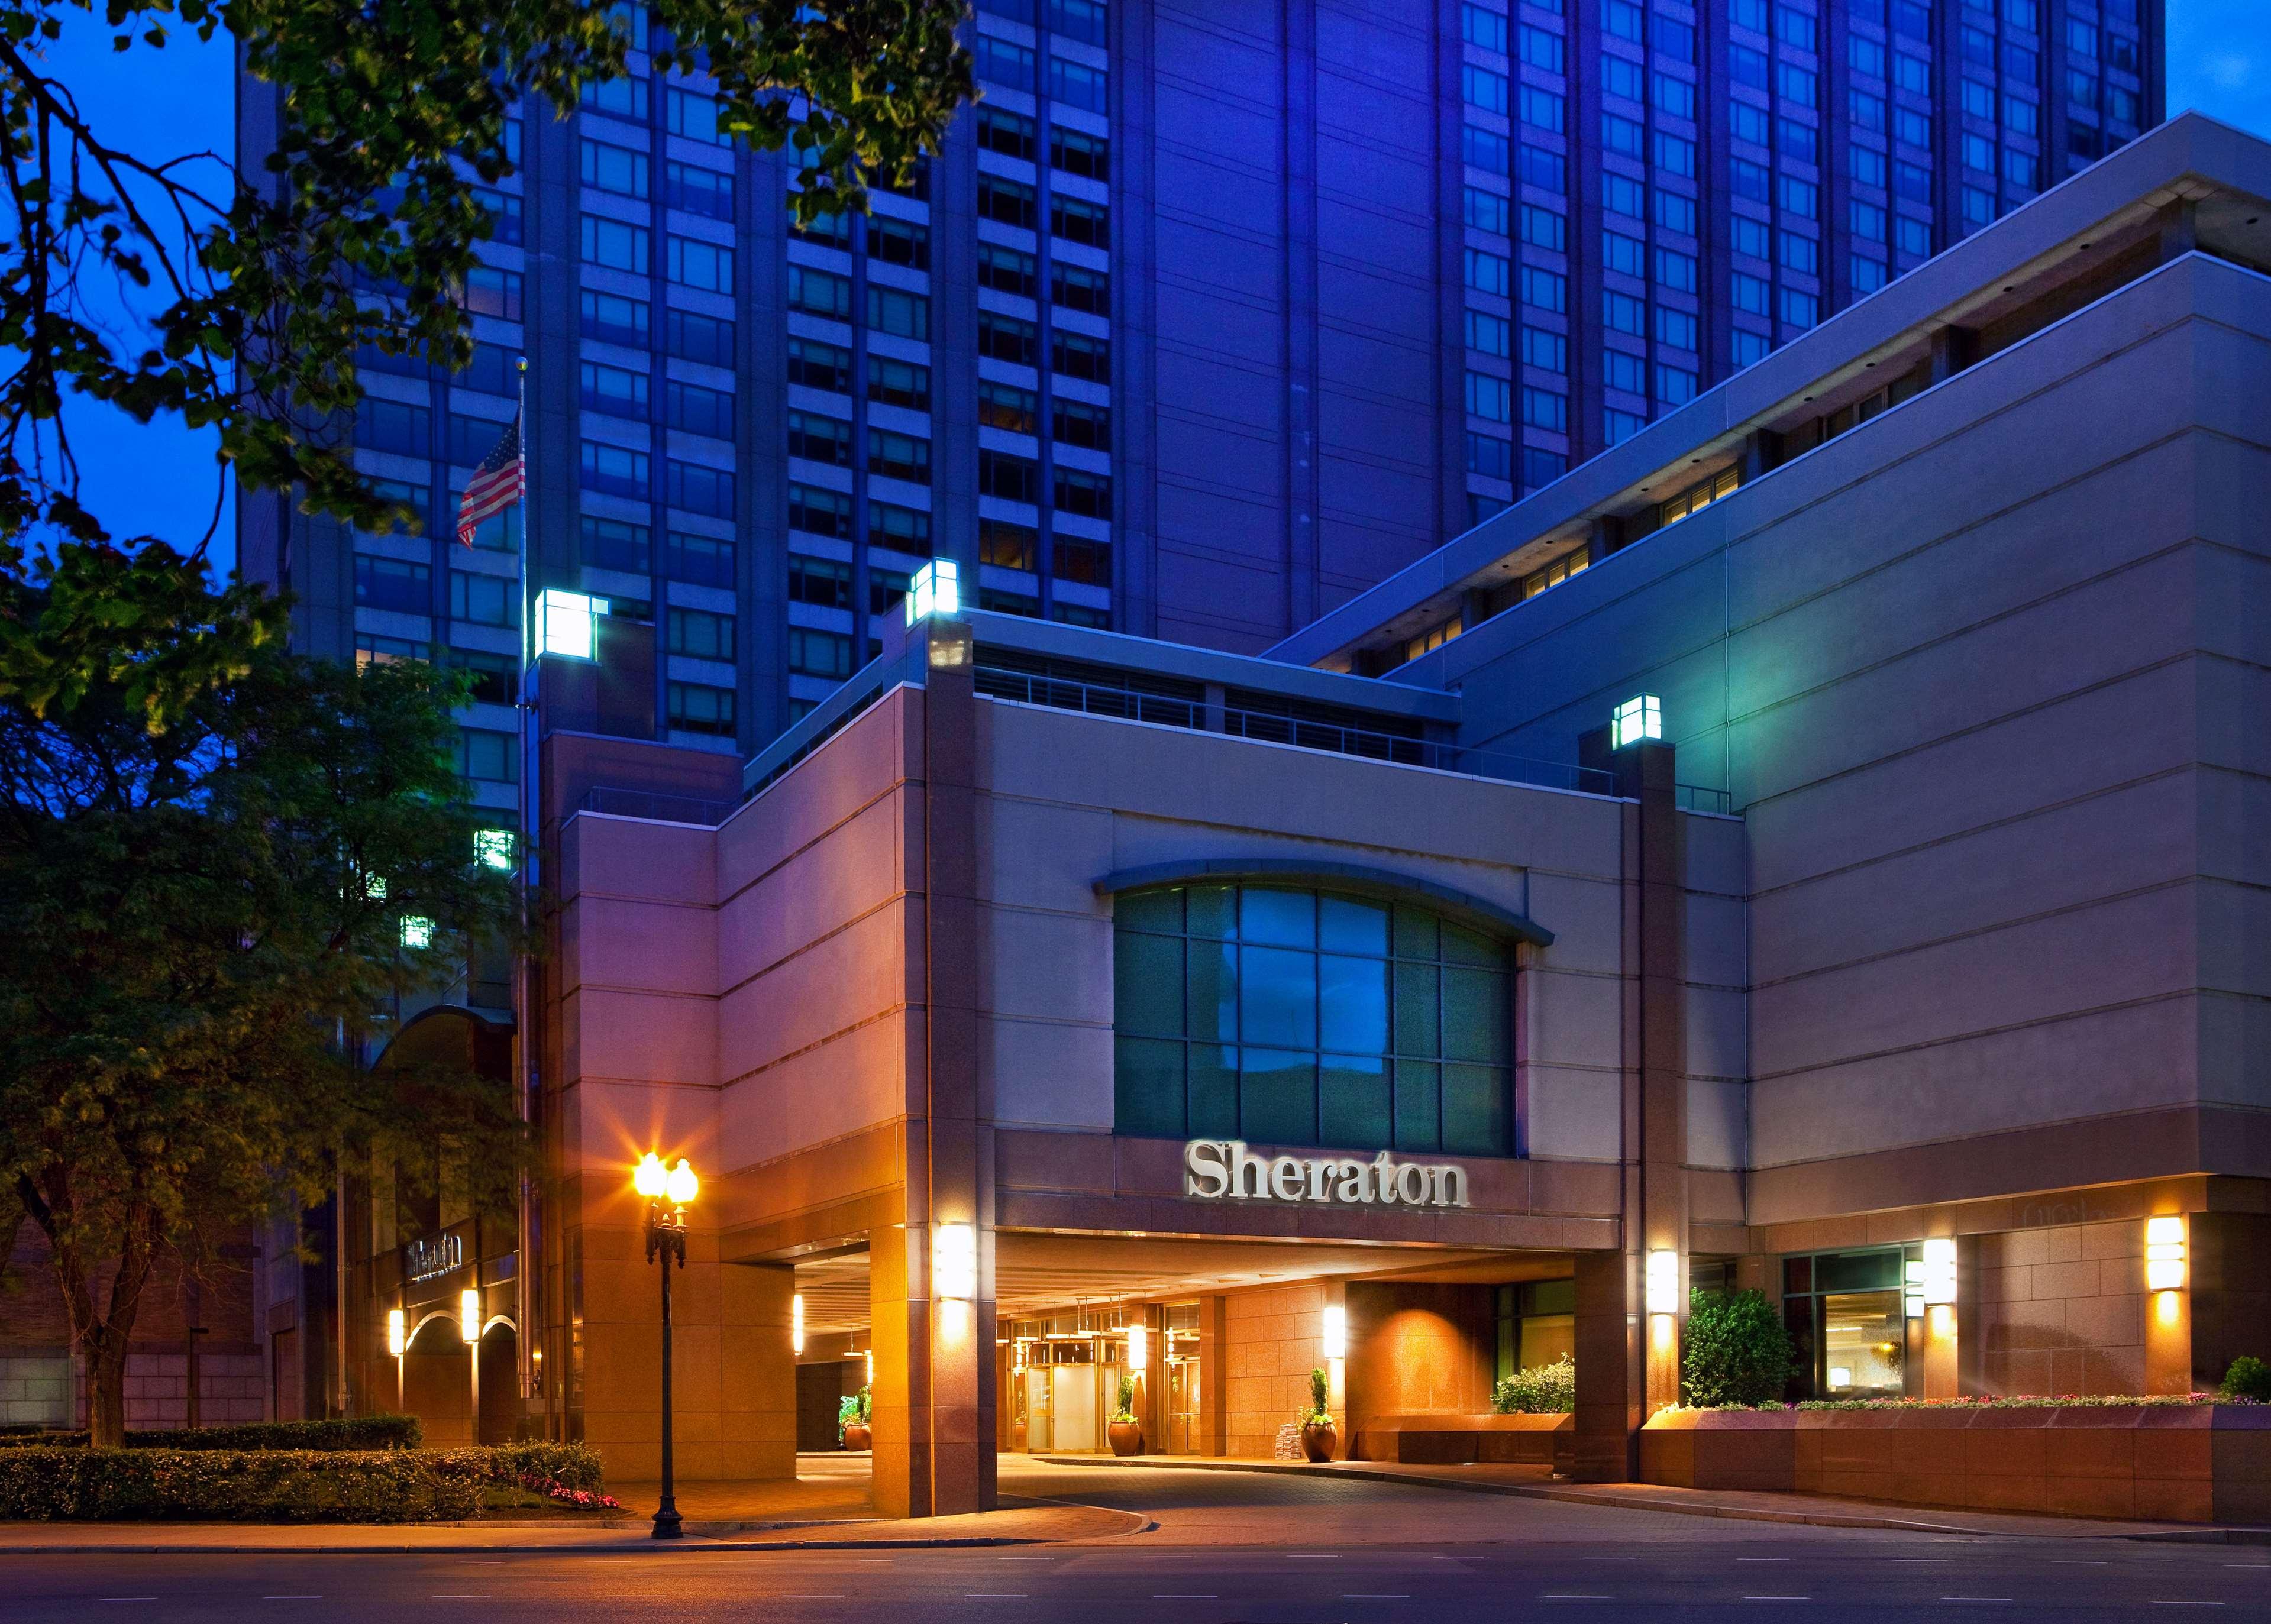 Sheraton Boston Hotel At 39 Dalton Street Boston Ma On Fave